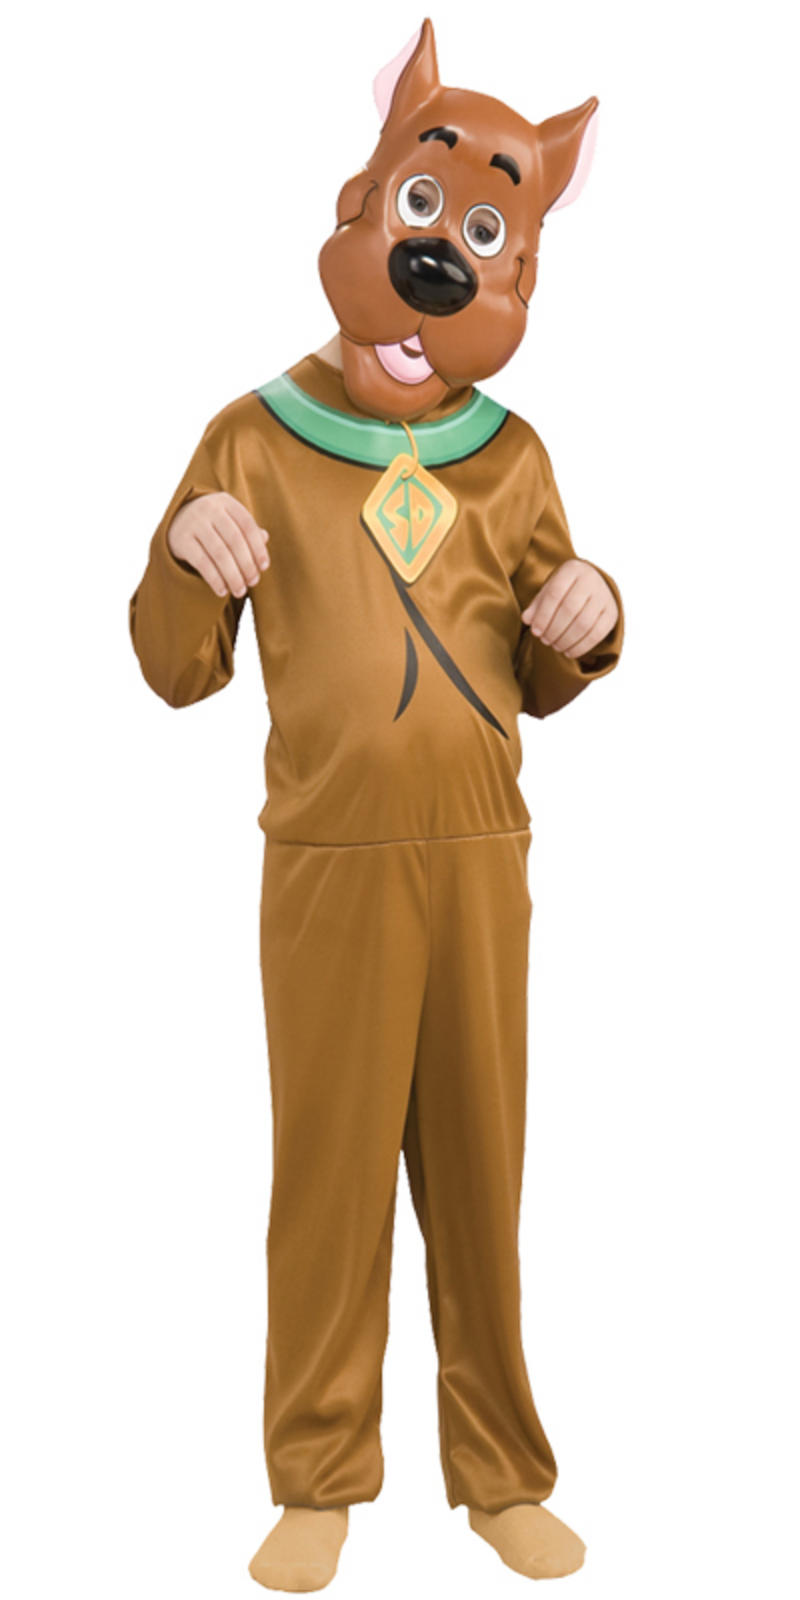 sentinel scooby doo dog kids fancy dress tv cartoon character childrens halloween costume